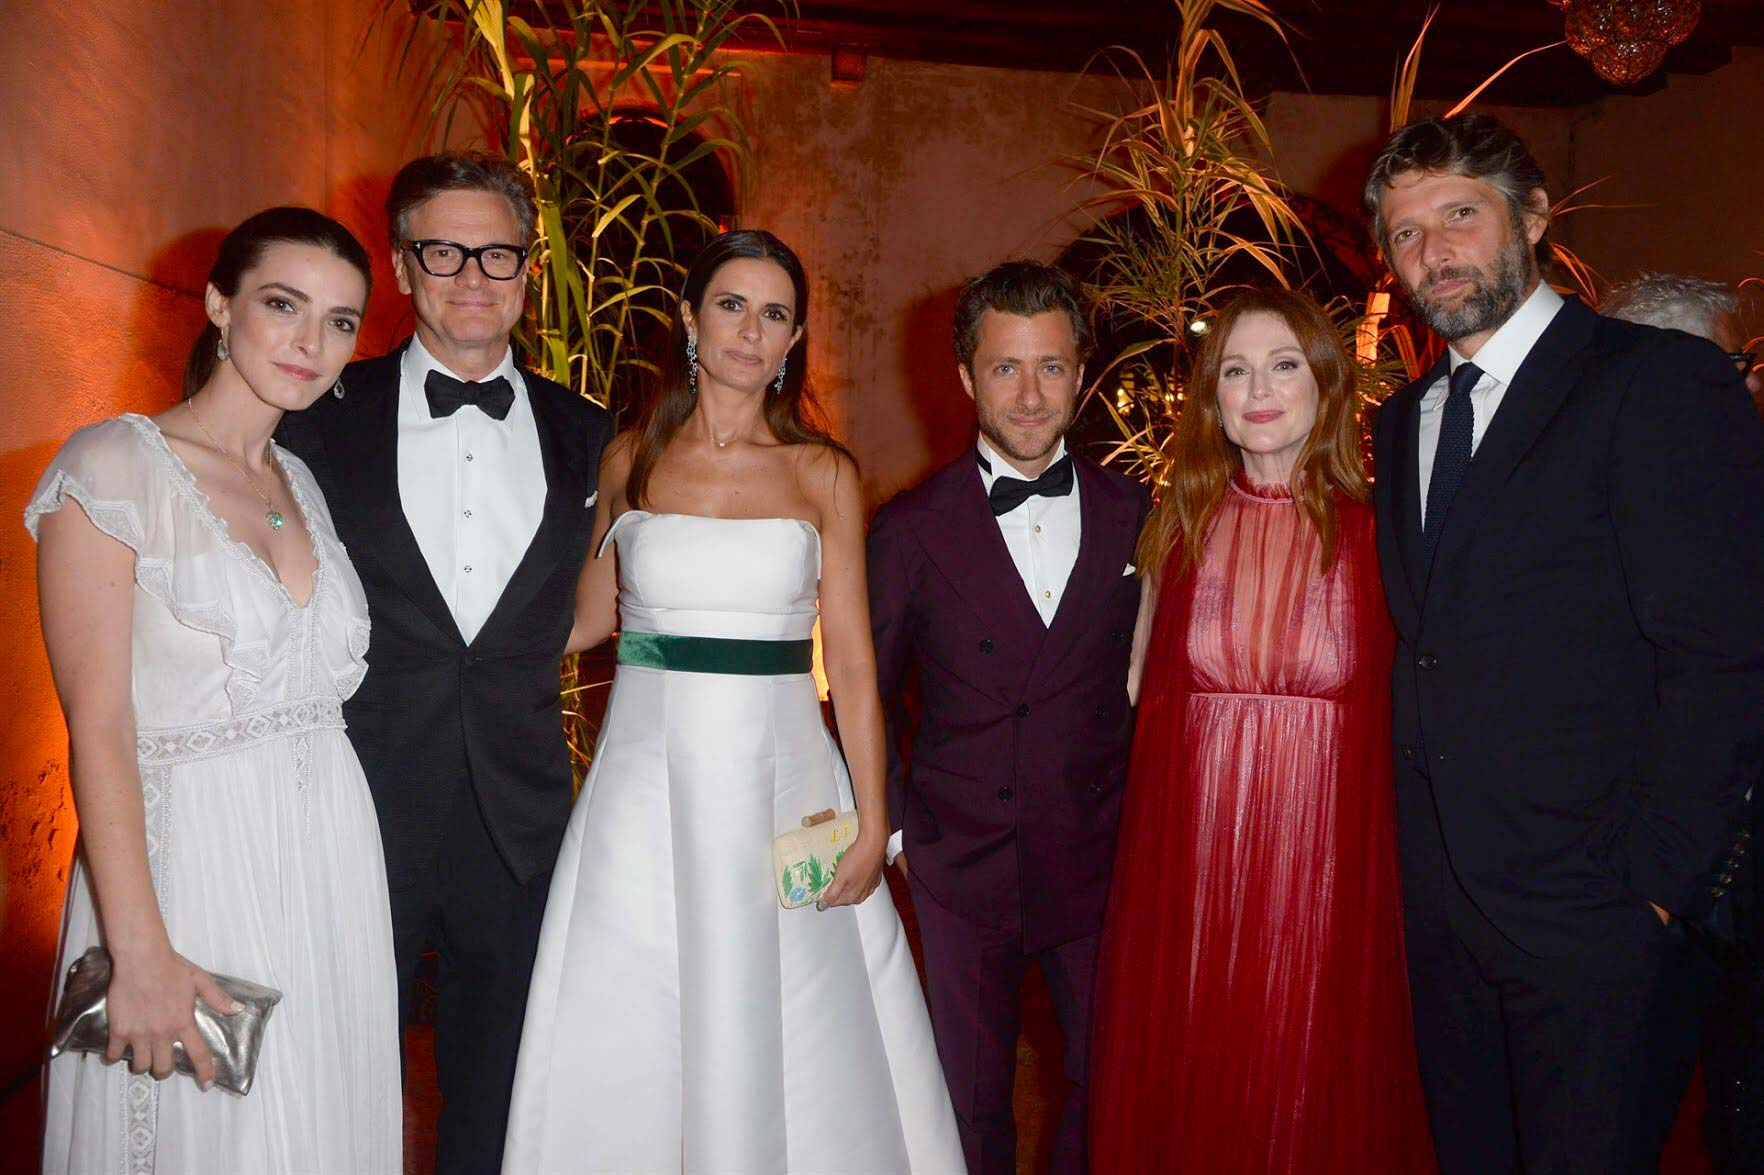 Venezia 2017 - Franca Sozzani award - Colin and Livia Firth - Hair Massimo Serini